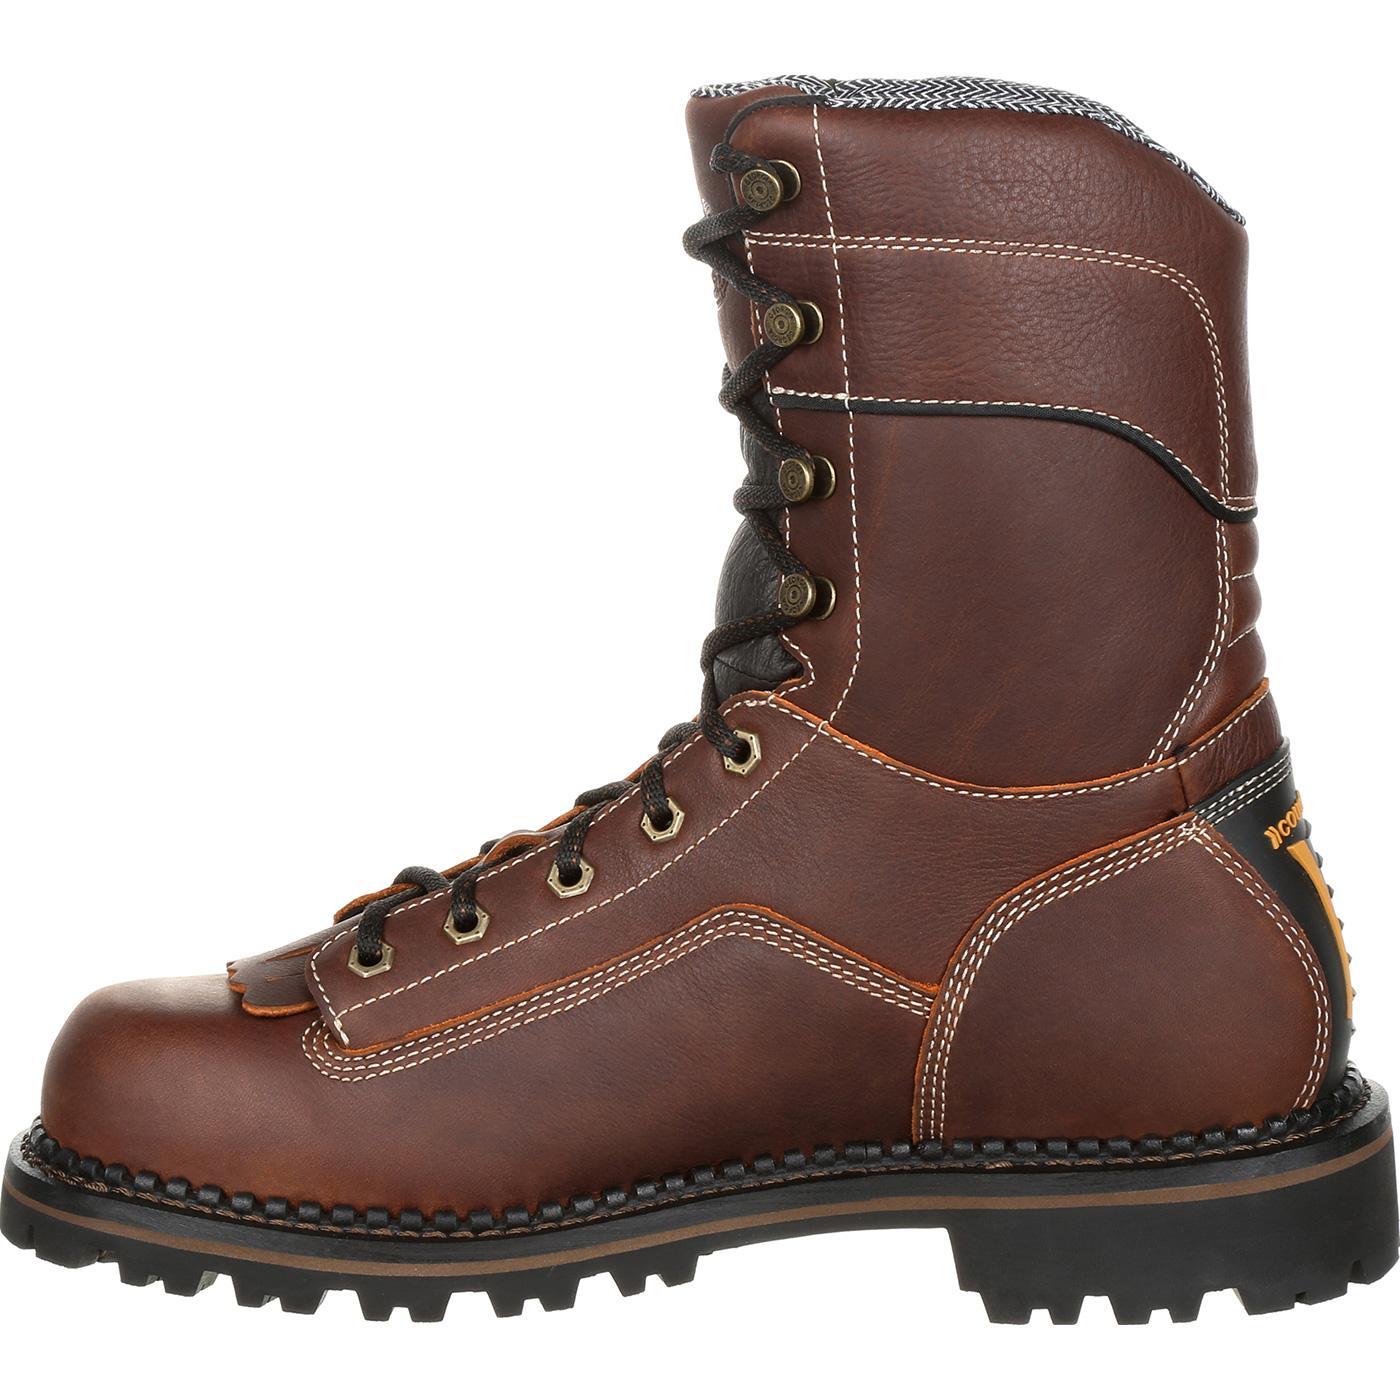 1400x1400 Gb00237, Georgia Boot Amp Lt Logger Low Heel Waterproof Work Boot